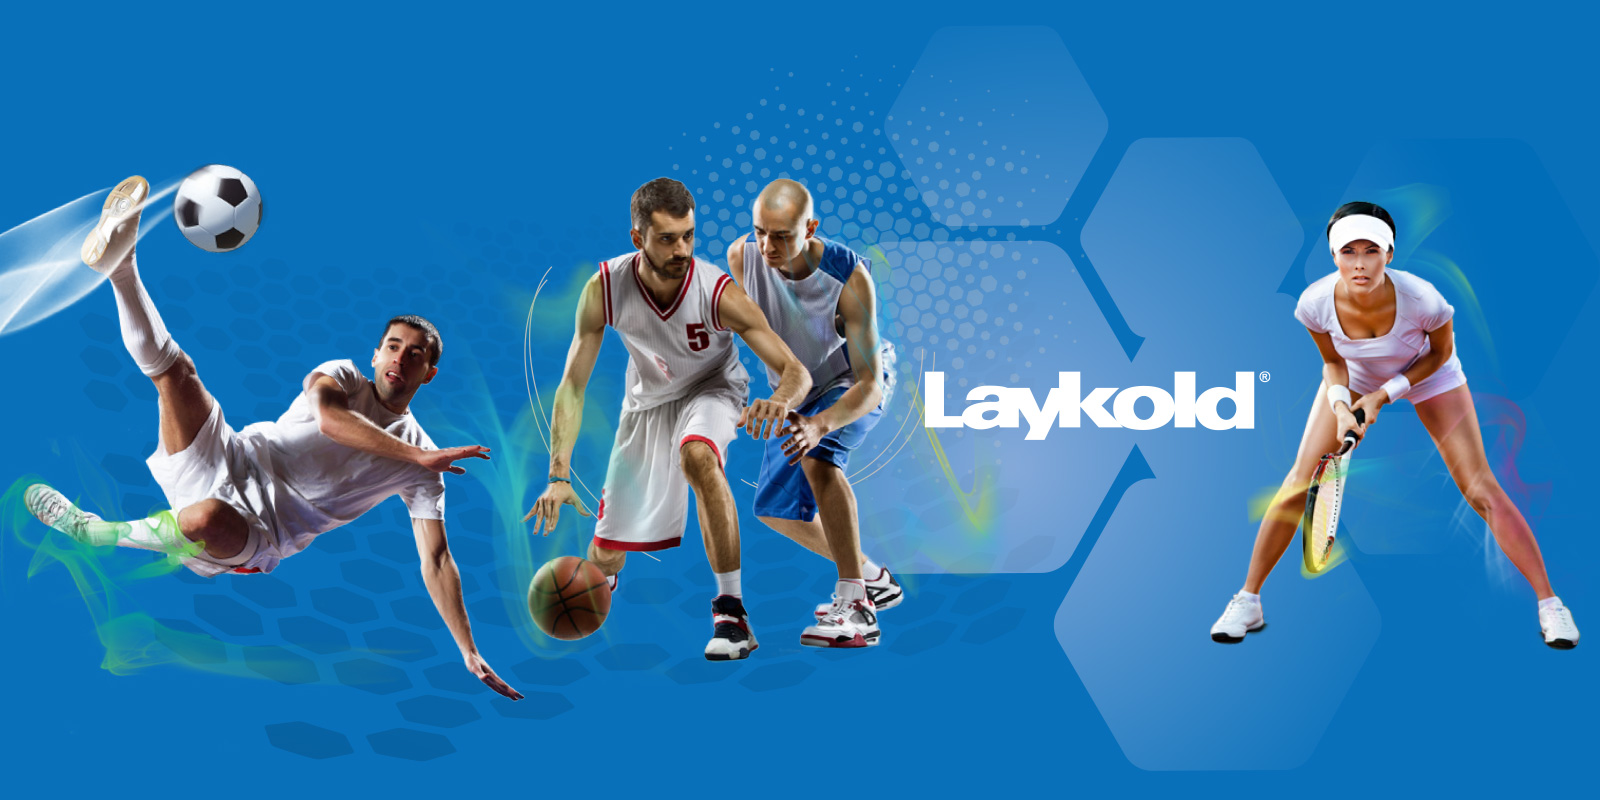 Layhold